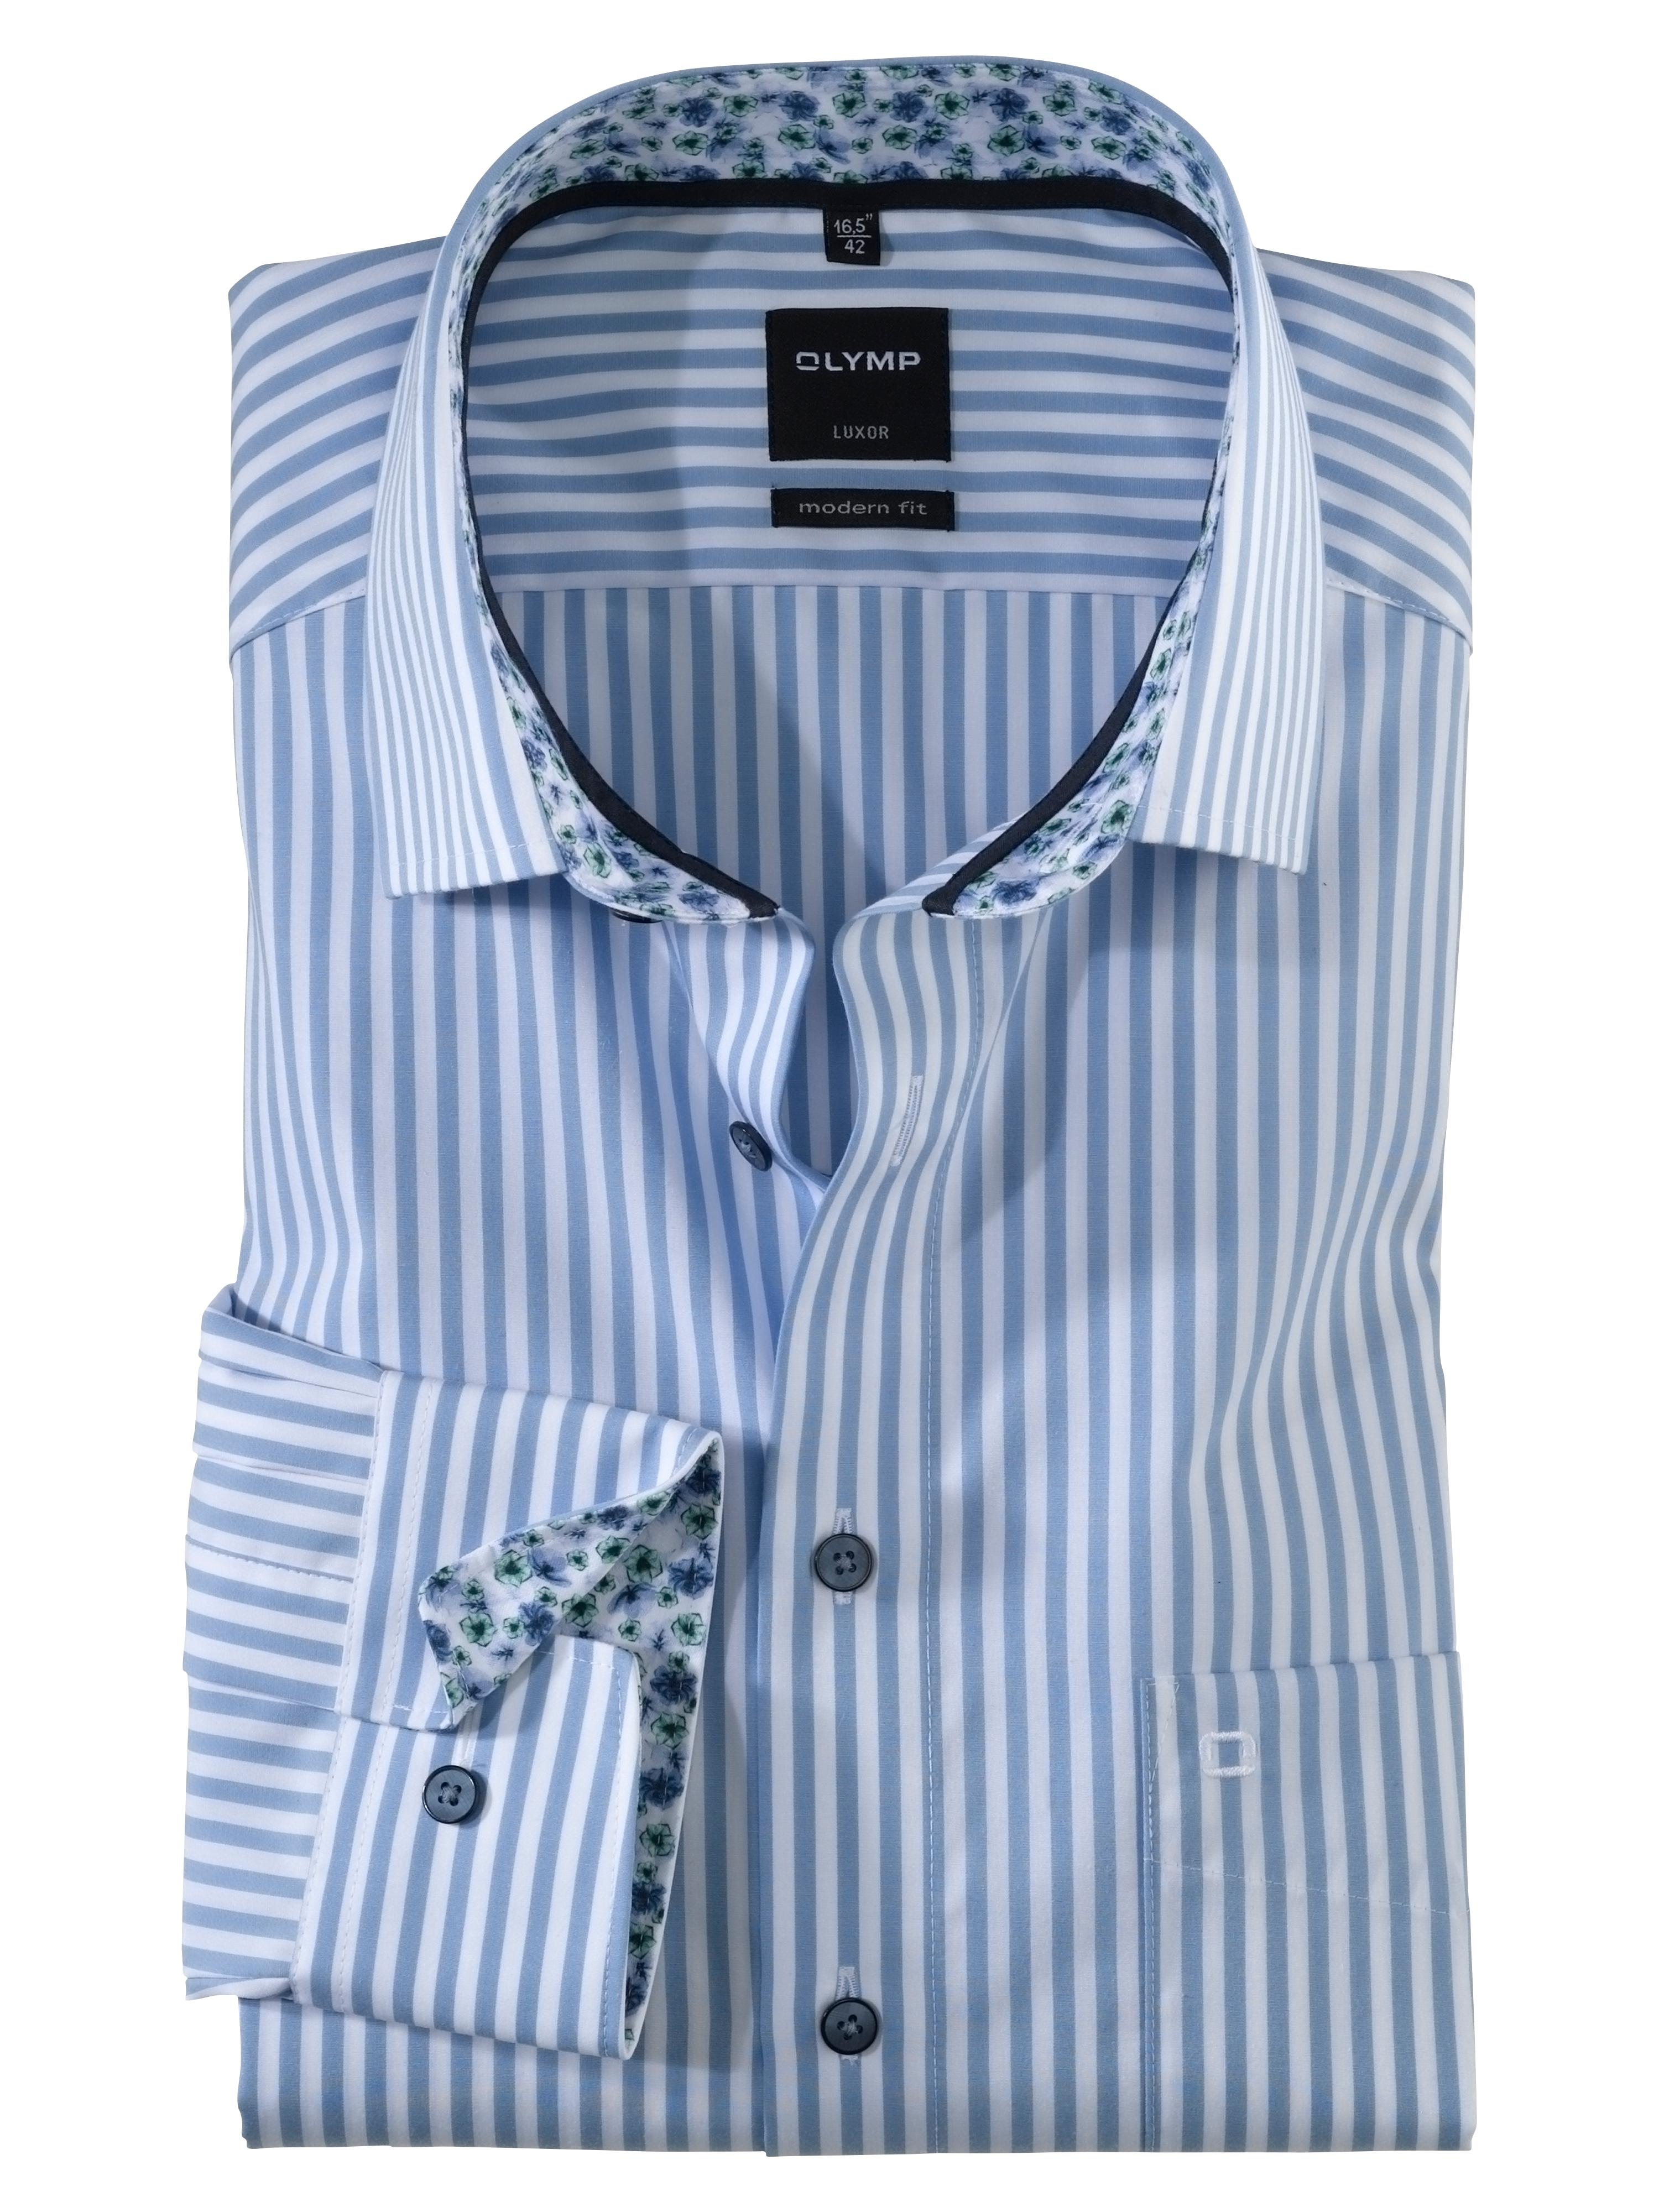 OLYMP Luxor Hemd, modern fit, Global Kent, Bleu, 46 | Bekleidung > Hemden > Sonstige Hemden | OLYMP